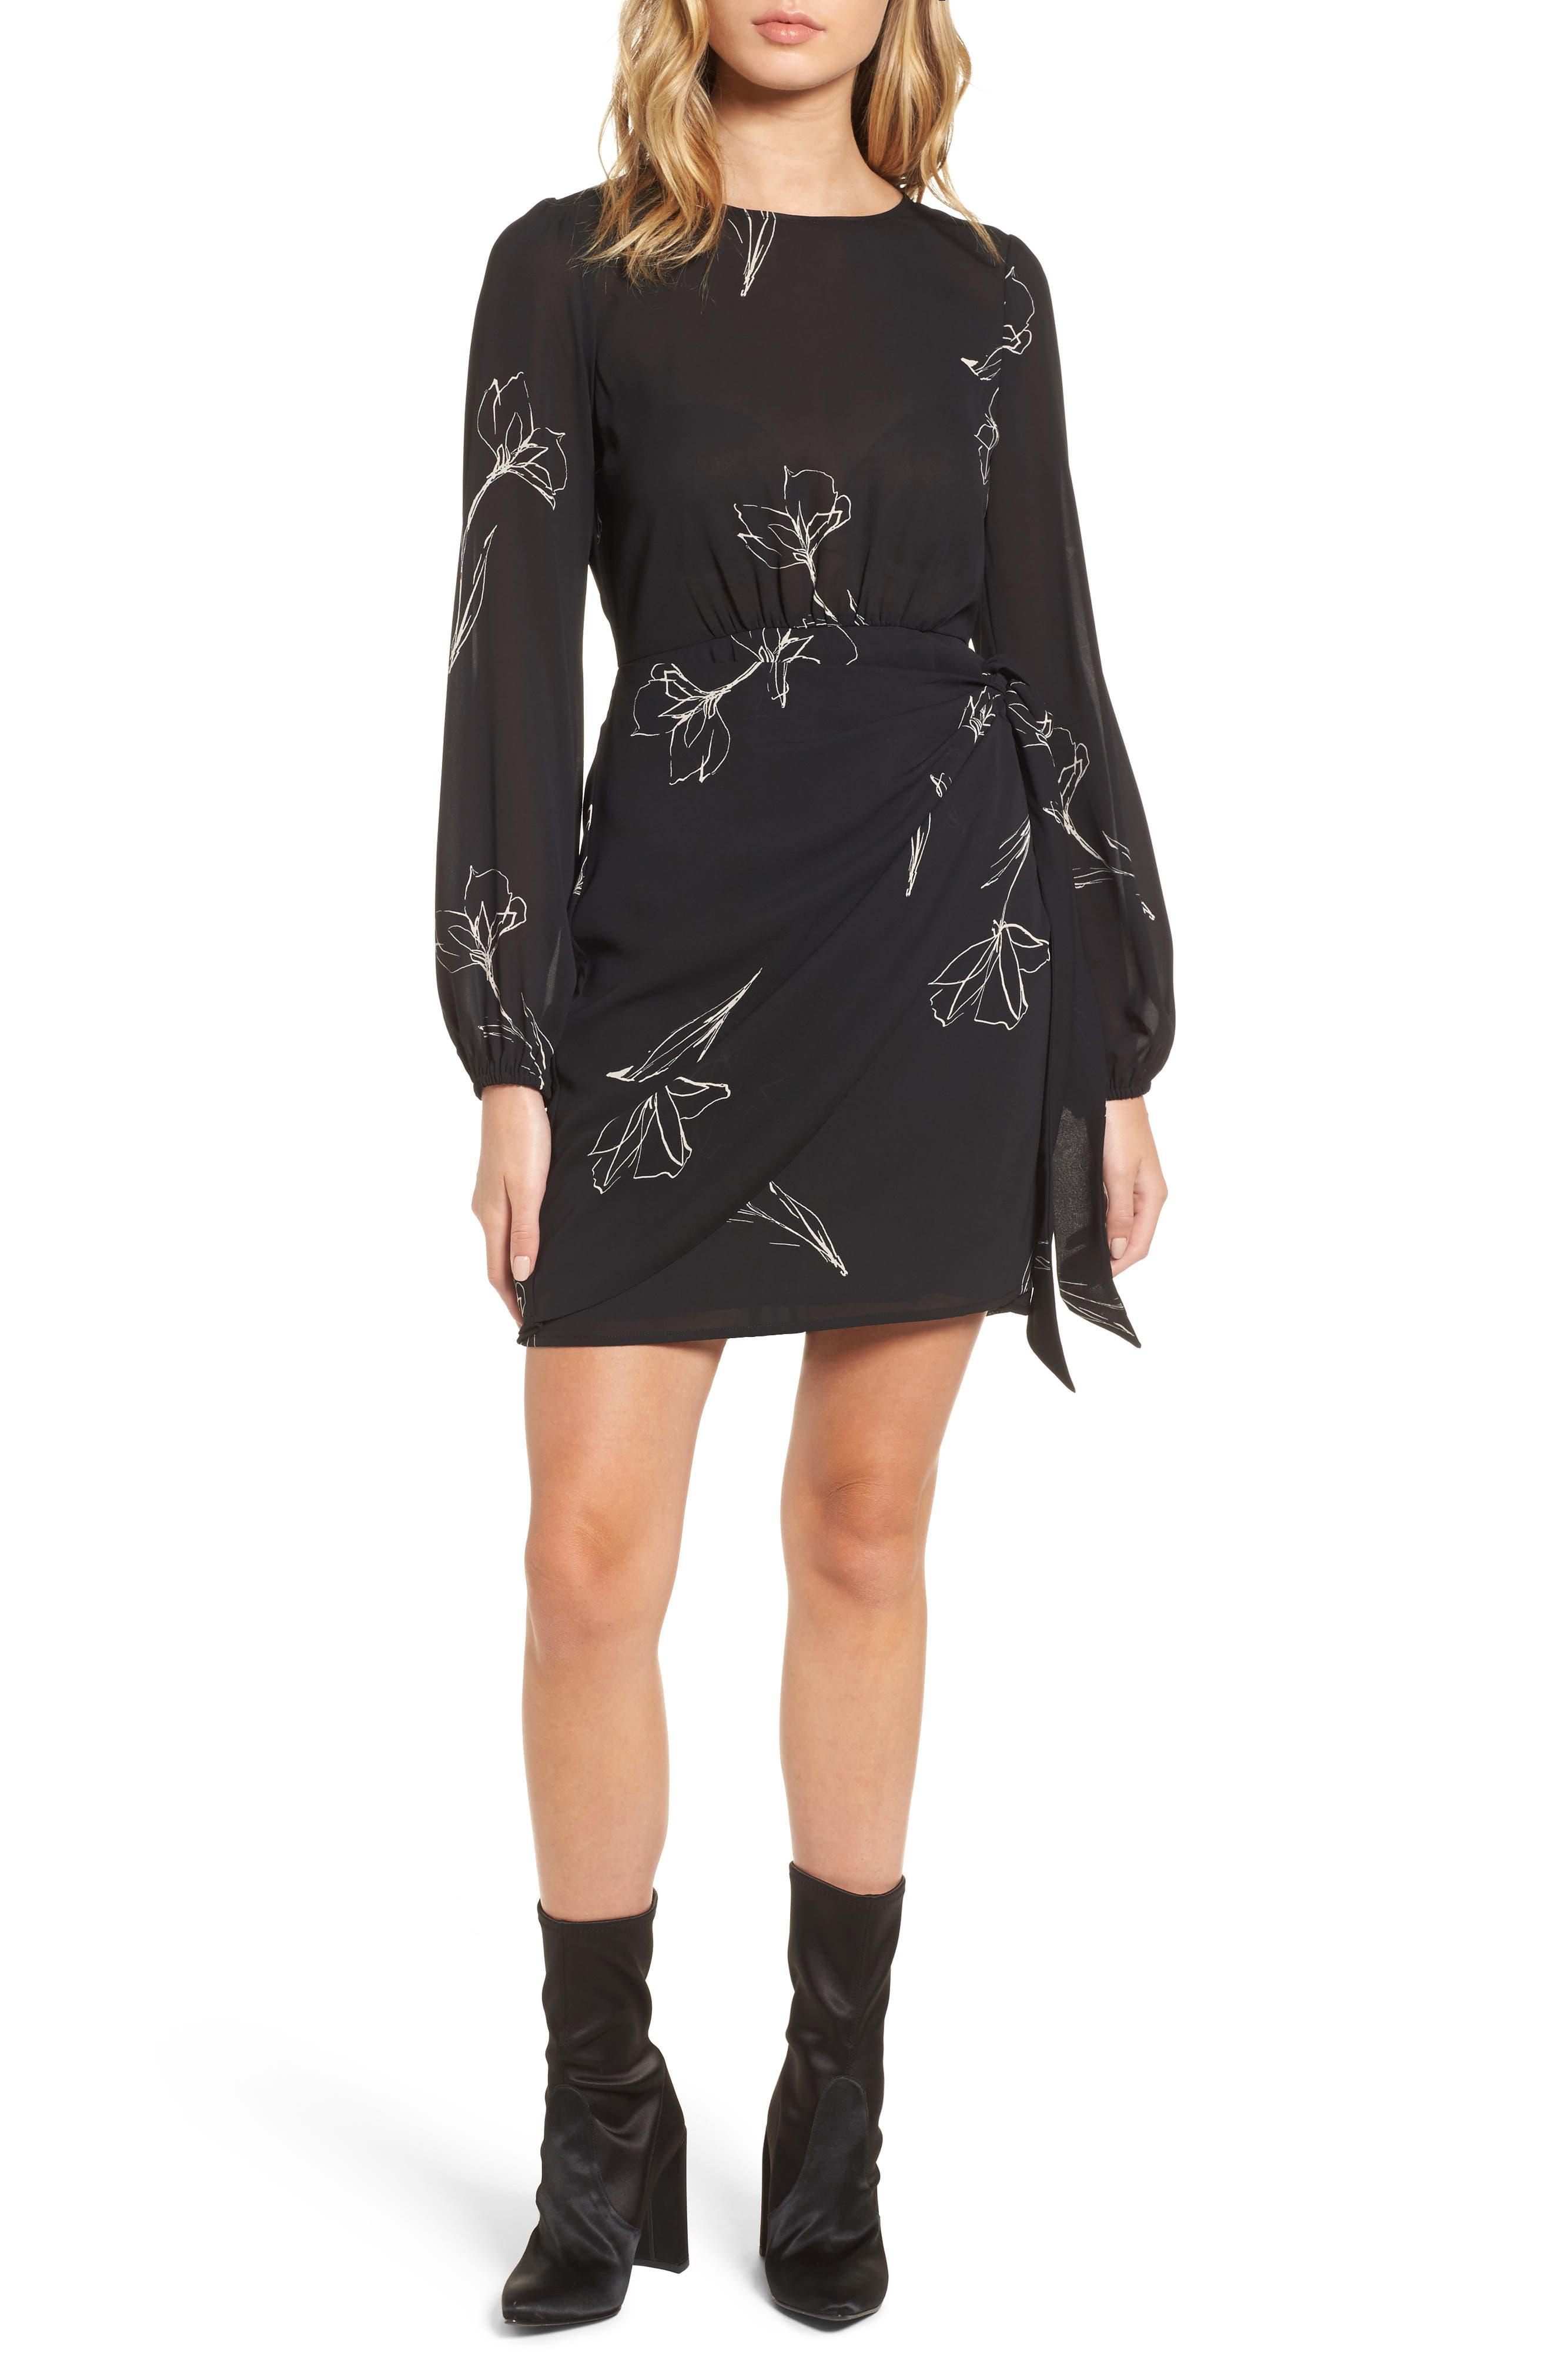 ASTR the Label Tie Skirt Dress